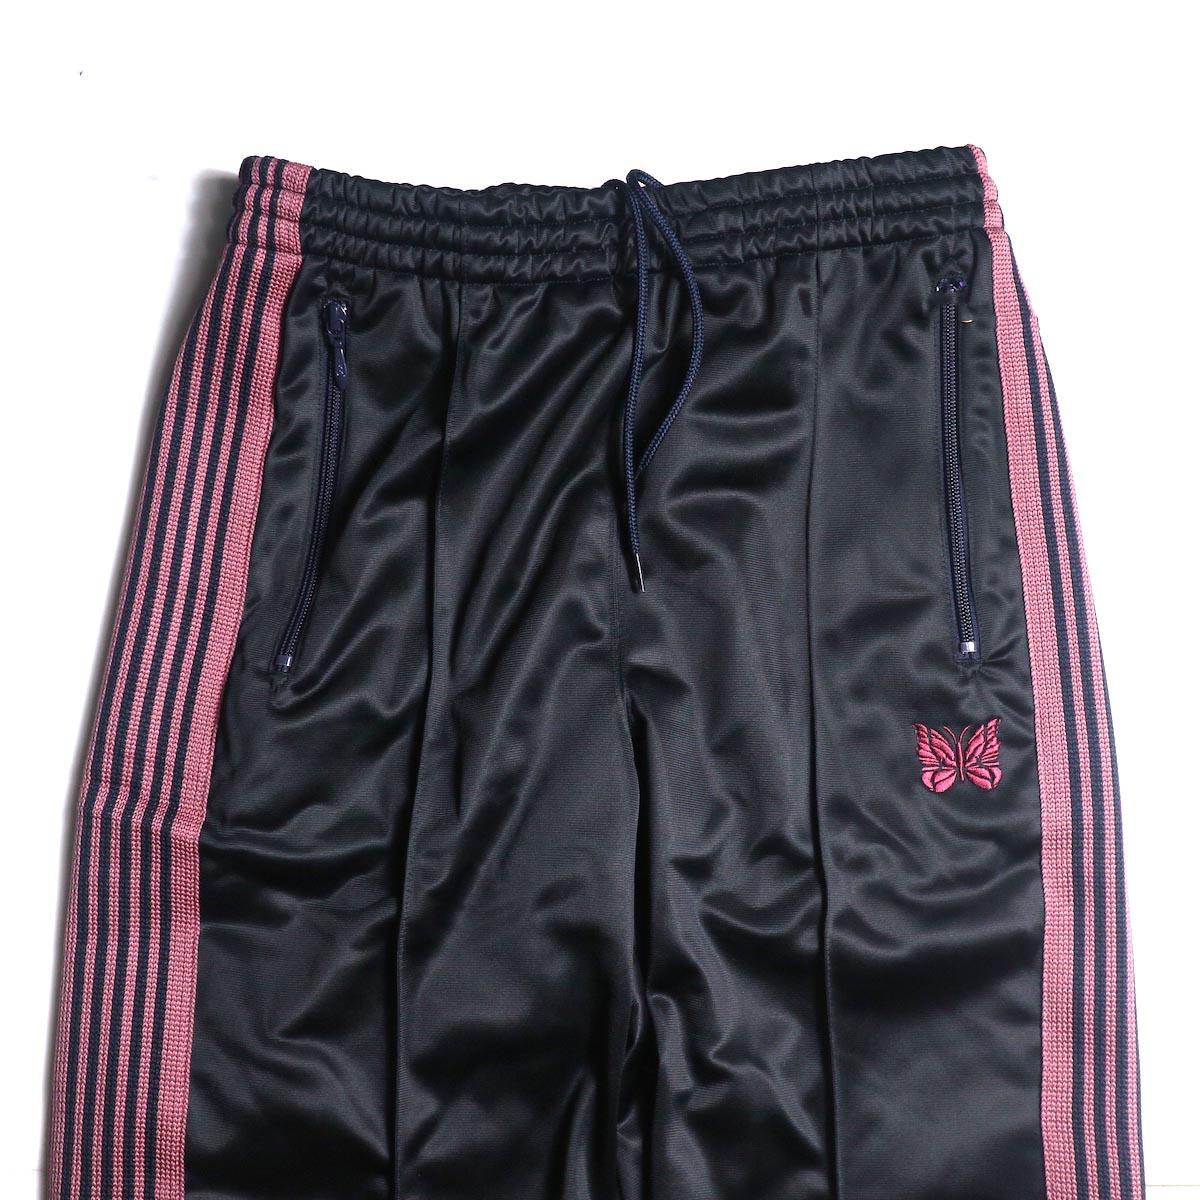 Needles / Track Pants -Pe/Ta Tricot (Navy)ウエスト